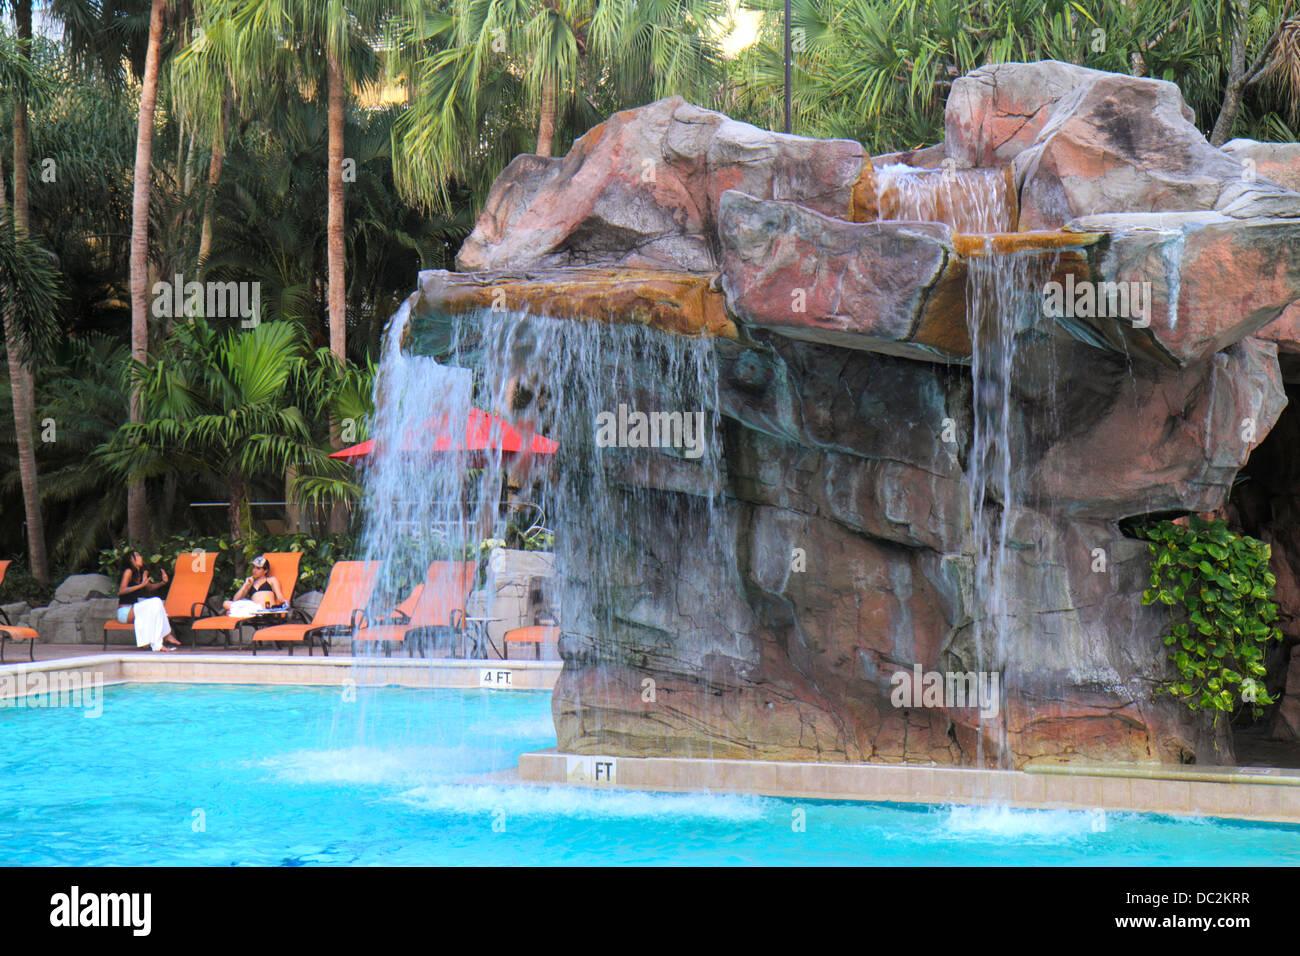 Florida Weston Fort Ft. Lauderdale Bonaventure Resort and & Spa hotel swimming pool area lounge chairs umbrella Stock Photo